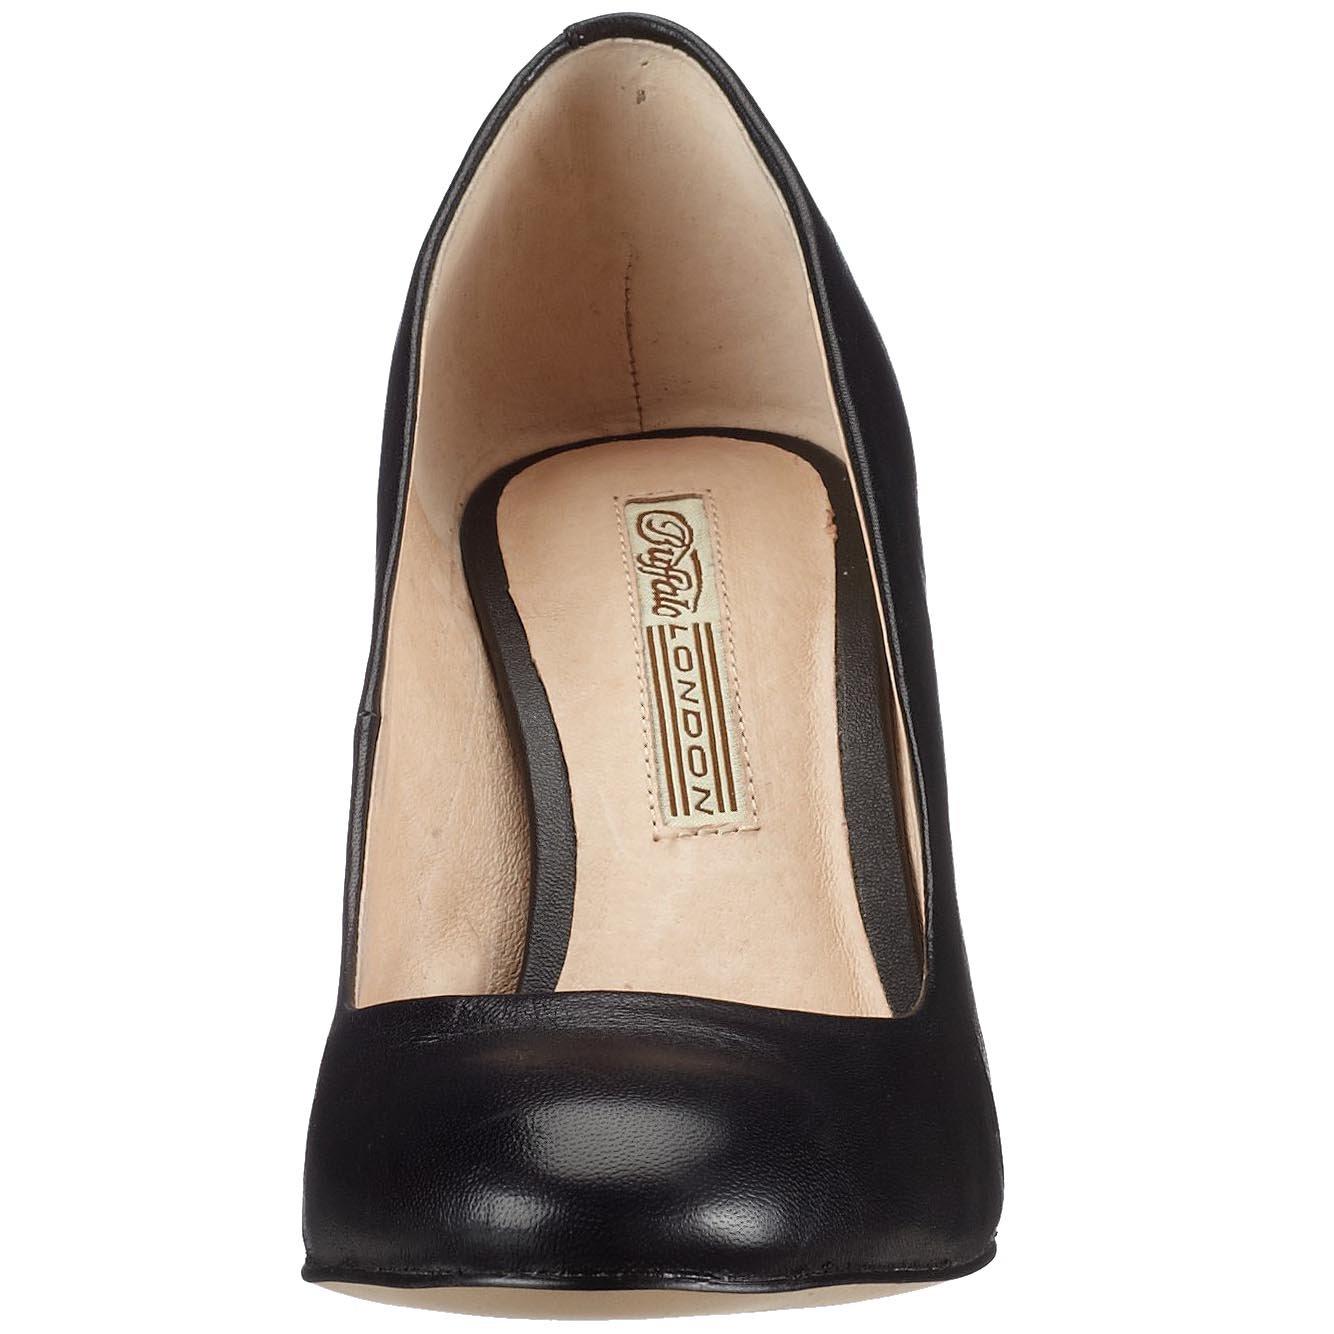 Buffalo London 109 5046, Scarpe eleganti  eleganti Scarpe donna  eleganti  f2d4d4